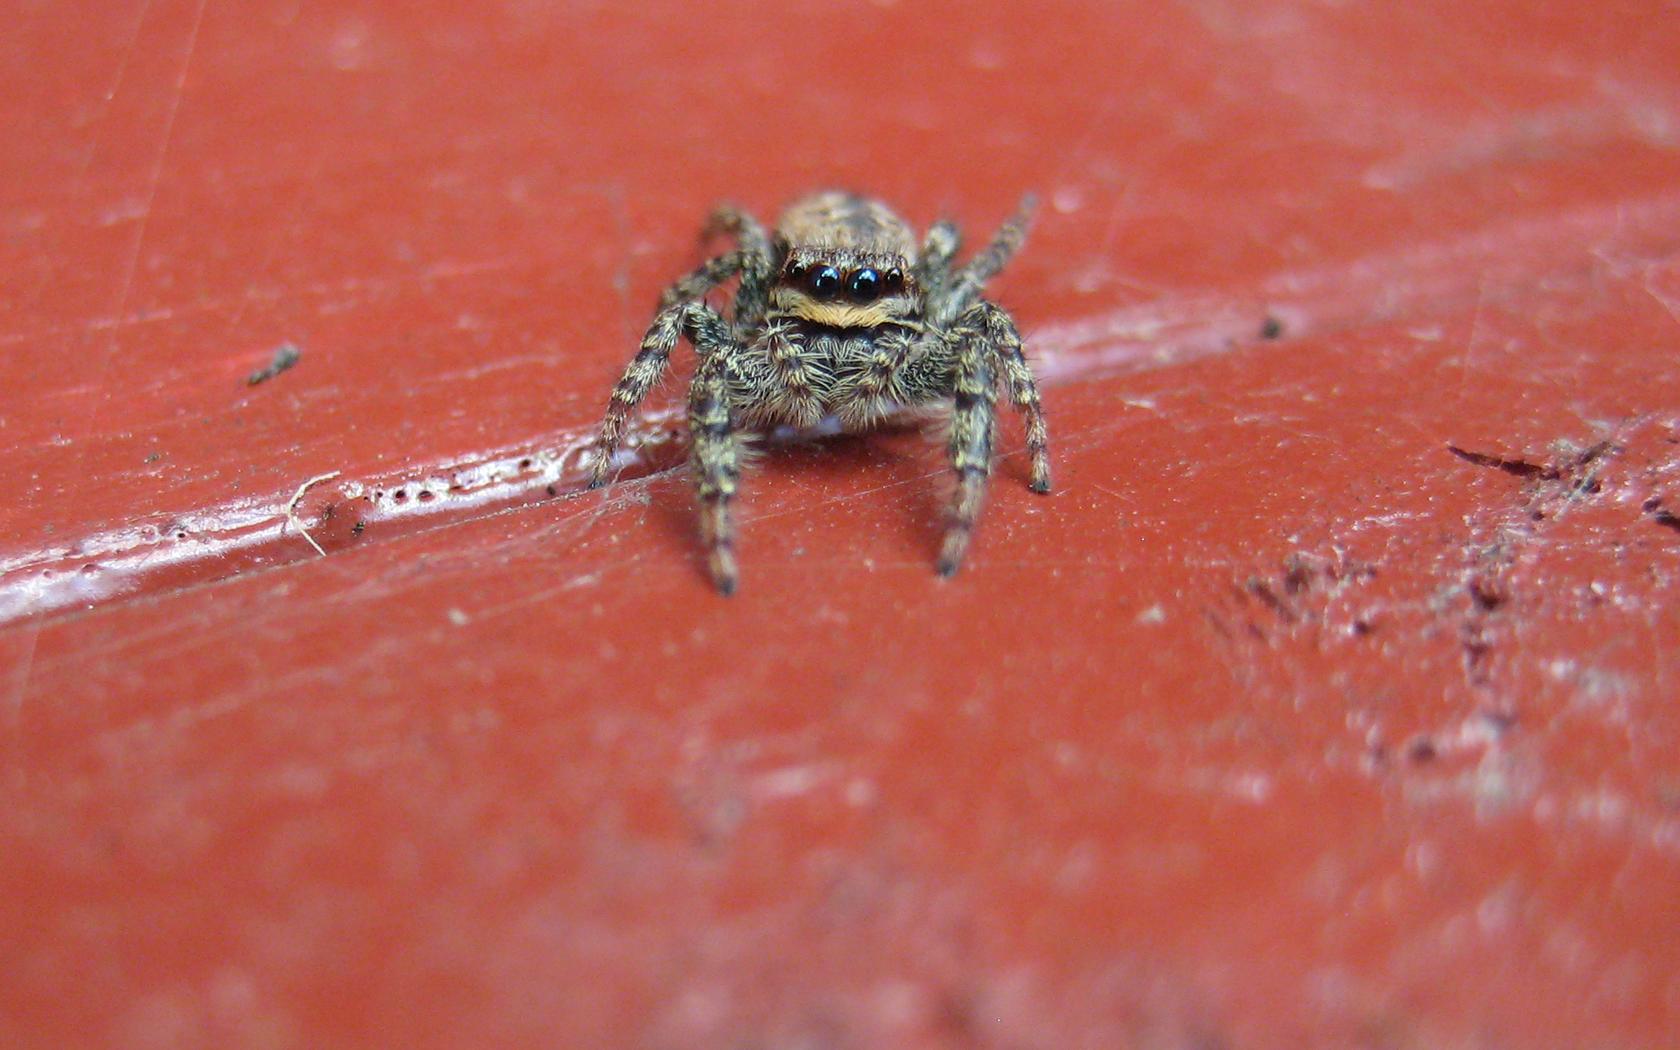 Spinne Makro (Überarbeitet)